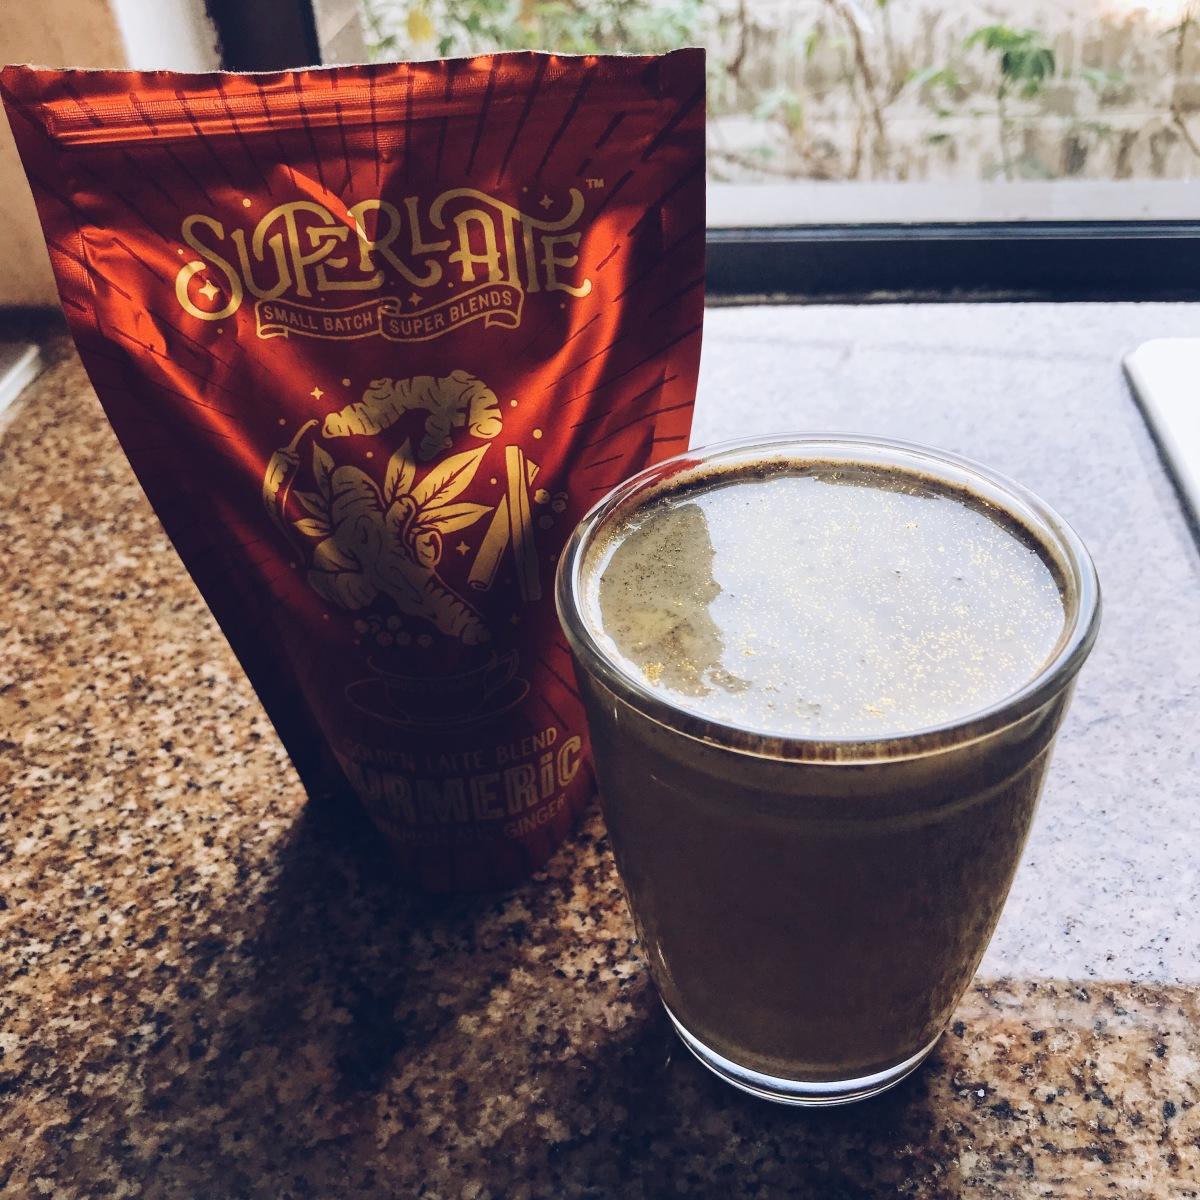 In review: Superlatte Golden Cup LatteBlend